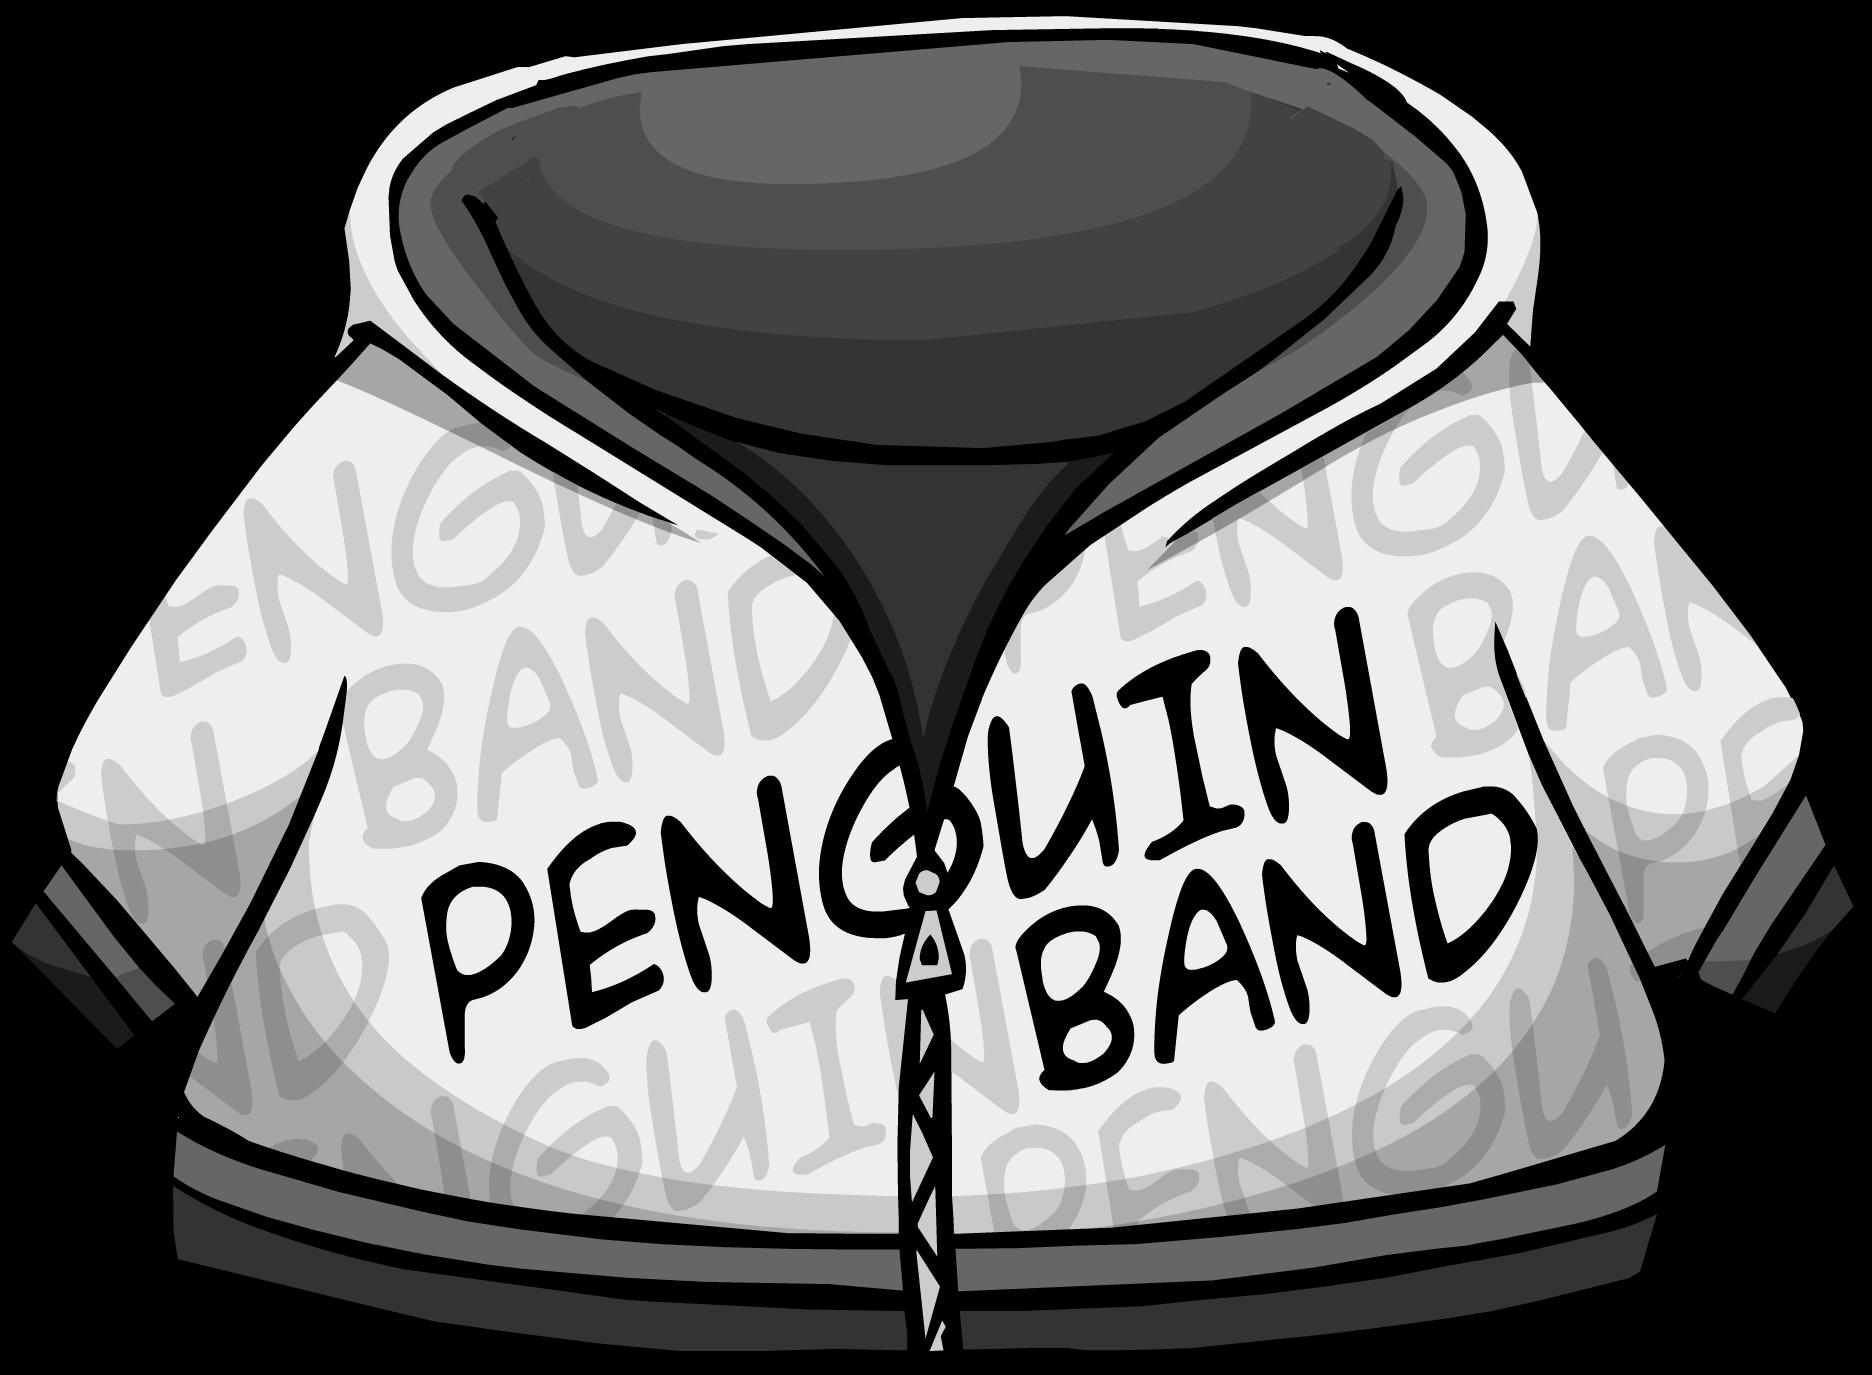 Penguin Band Hoodie